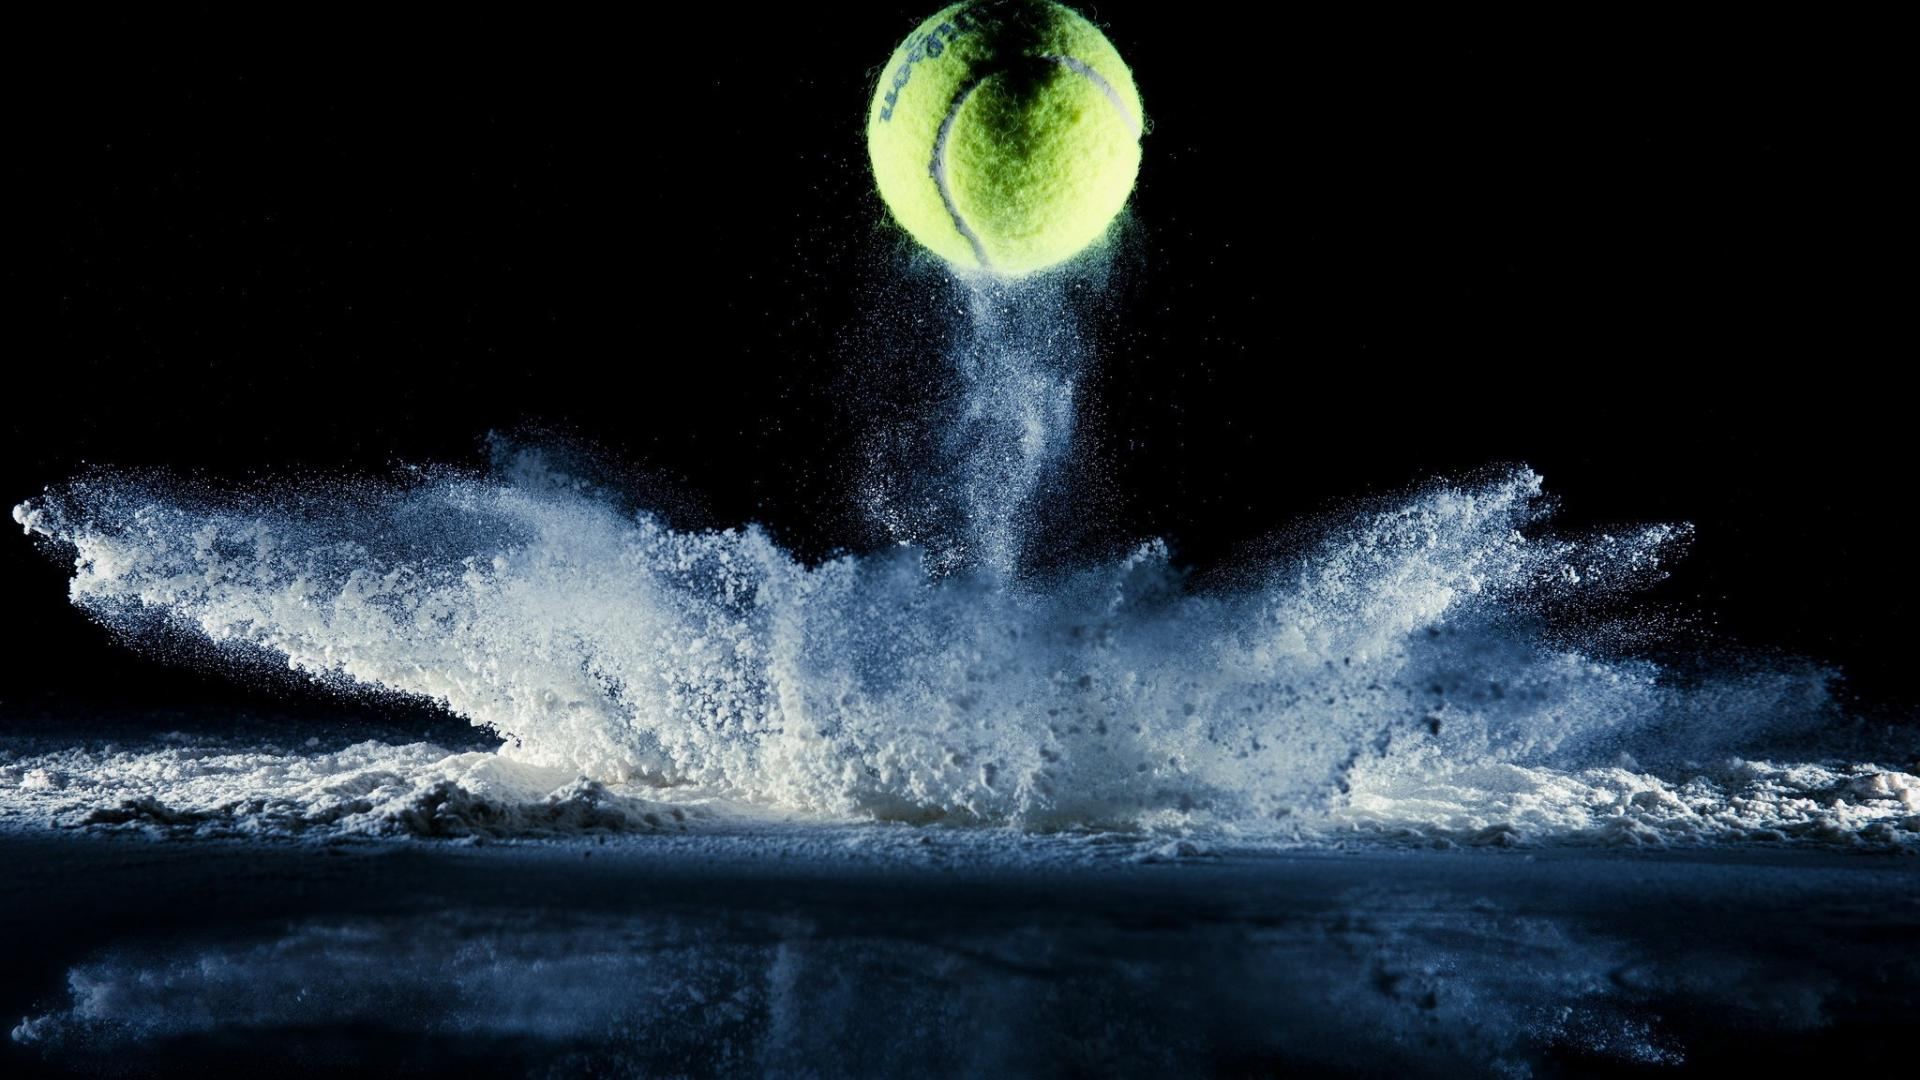 tennis wallpaper iphone